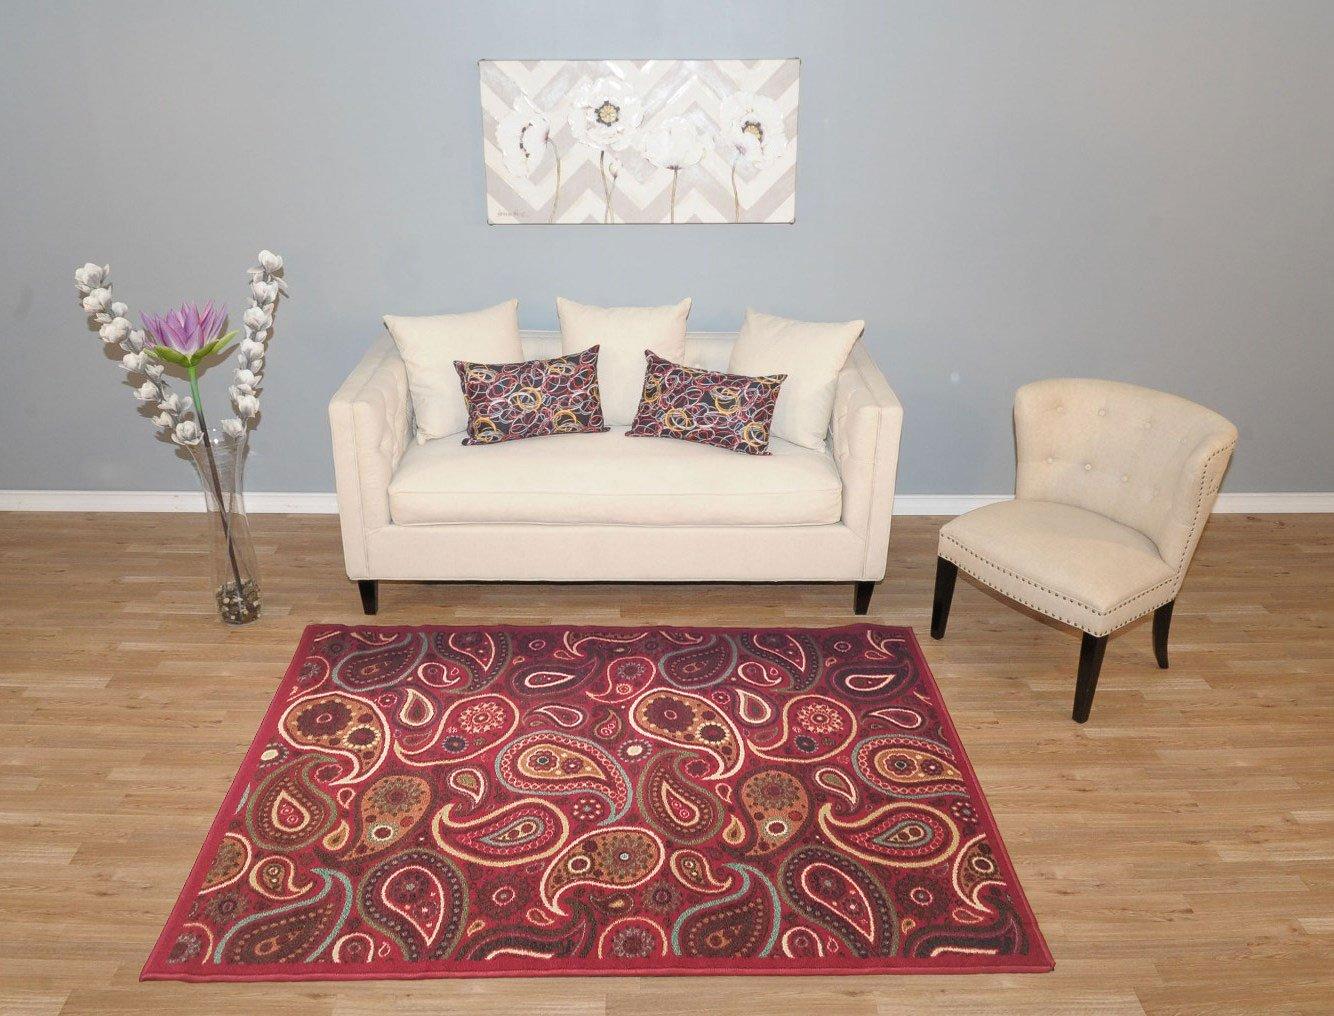 amazoncom new multi paisley design rubber backed durable area rug carpet 5x7 kitchen u0026 dining - 5x7 Area Rugs